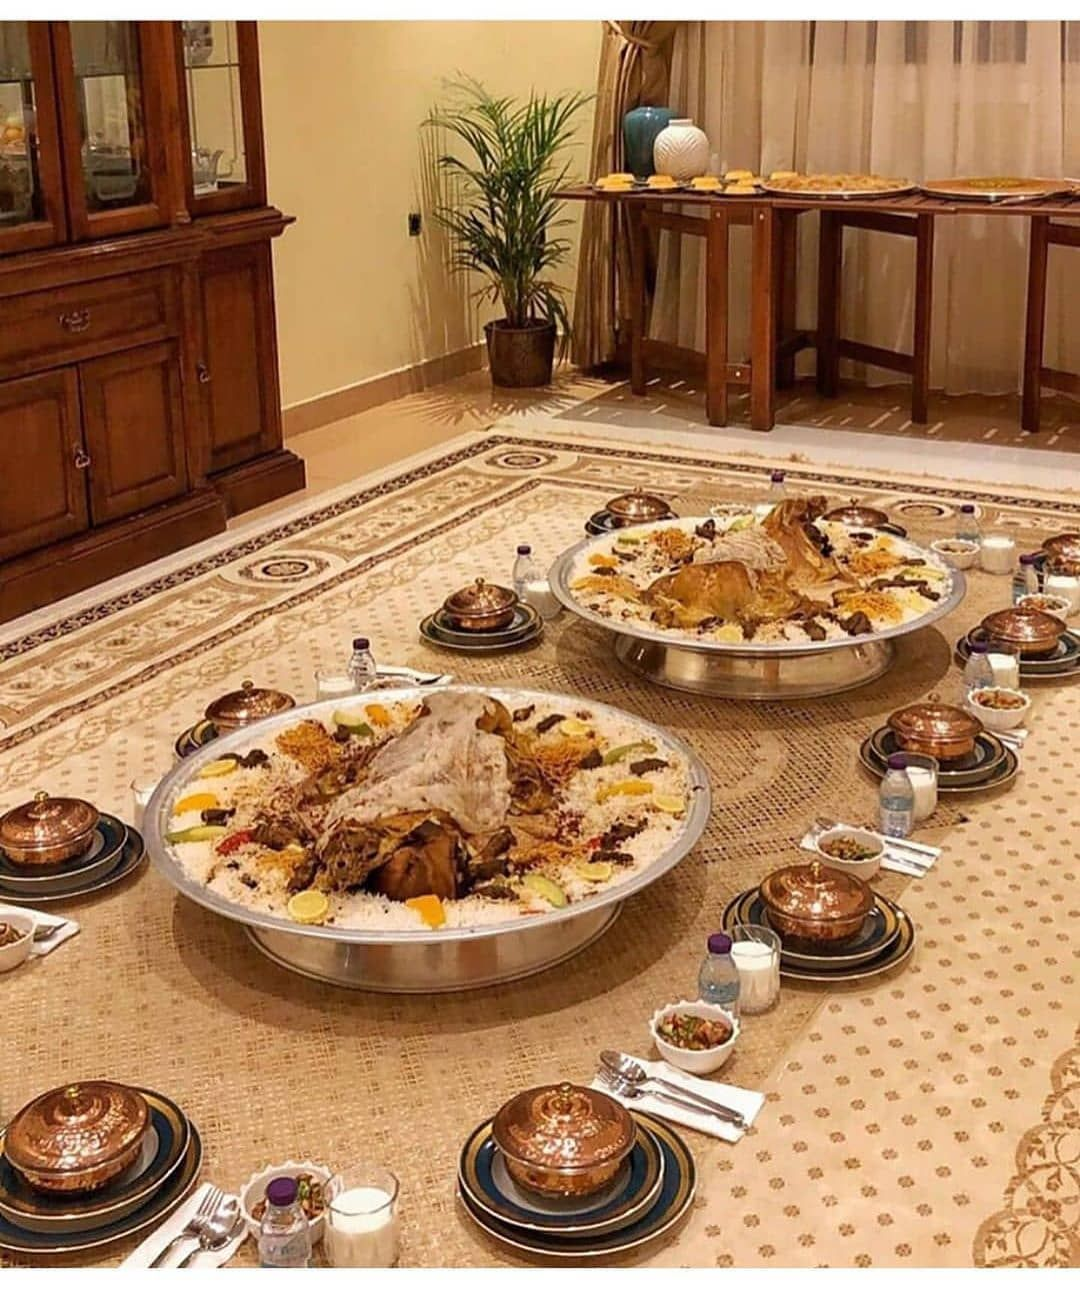 Pin By Salgai On Arabic Food Lunch Meal Prep Food Presentation Arabic Food